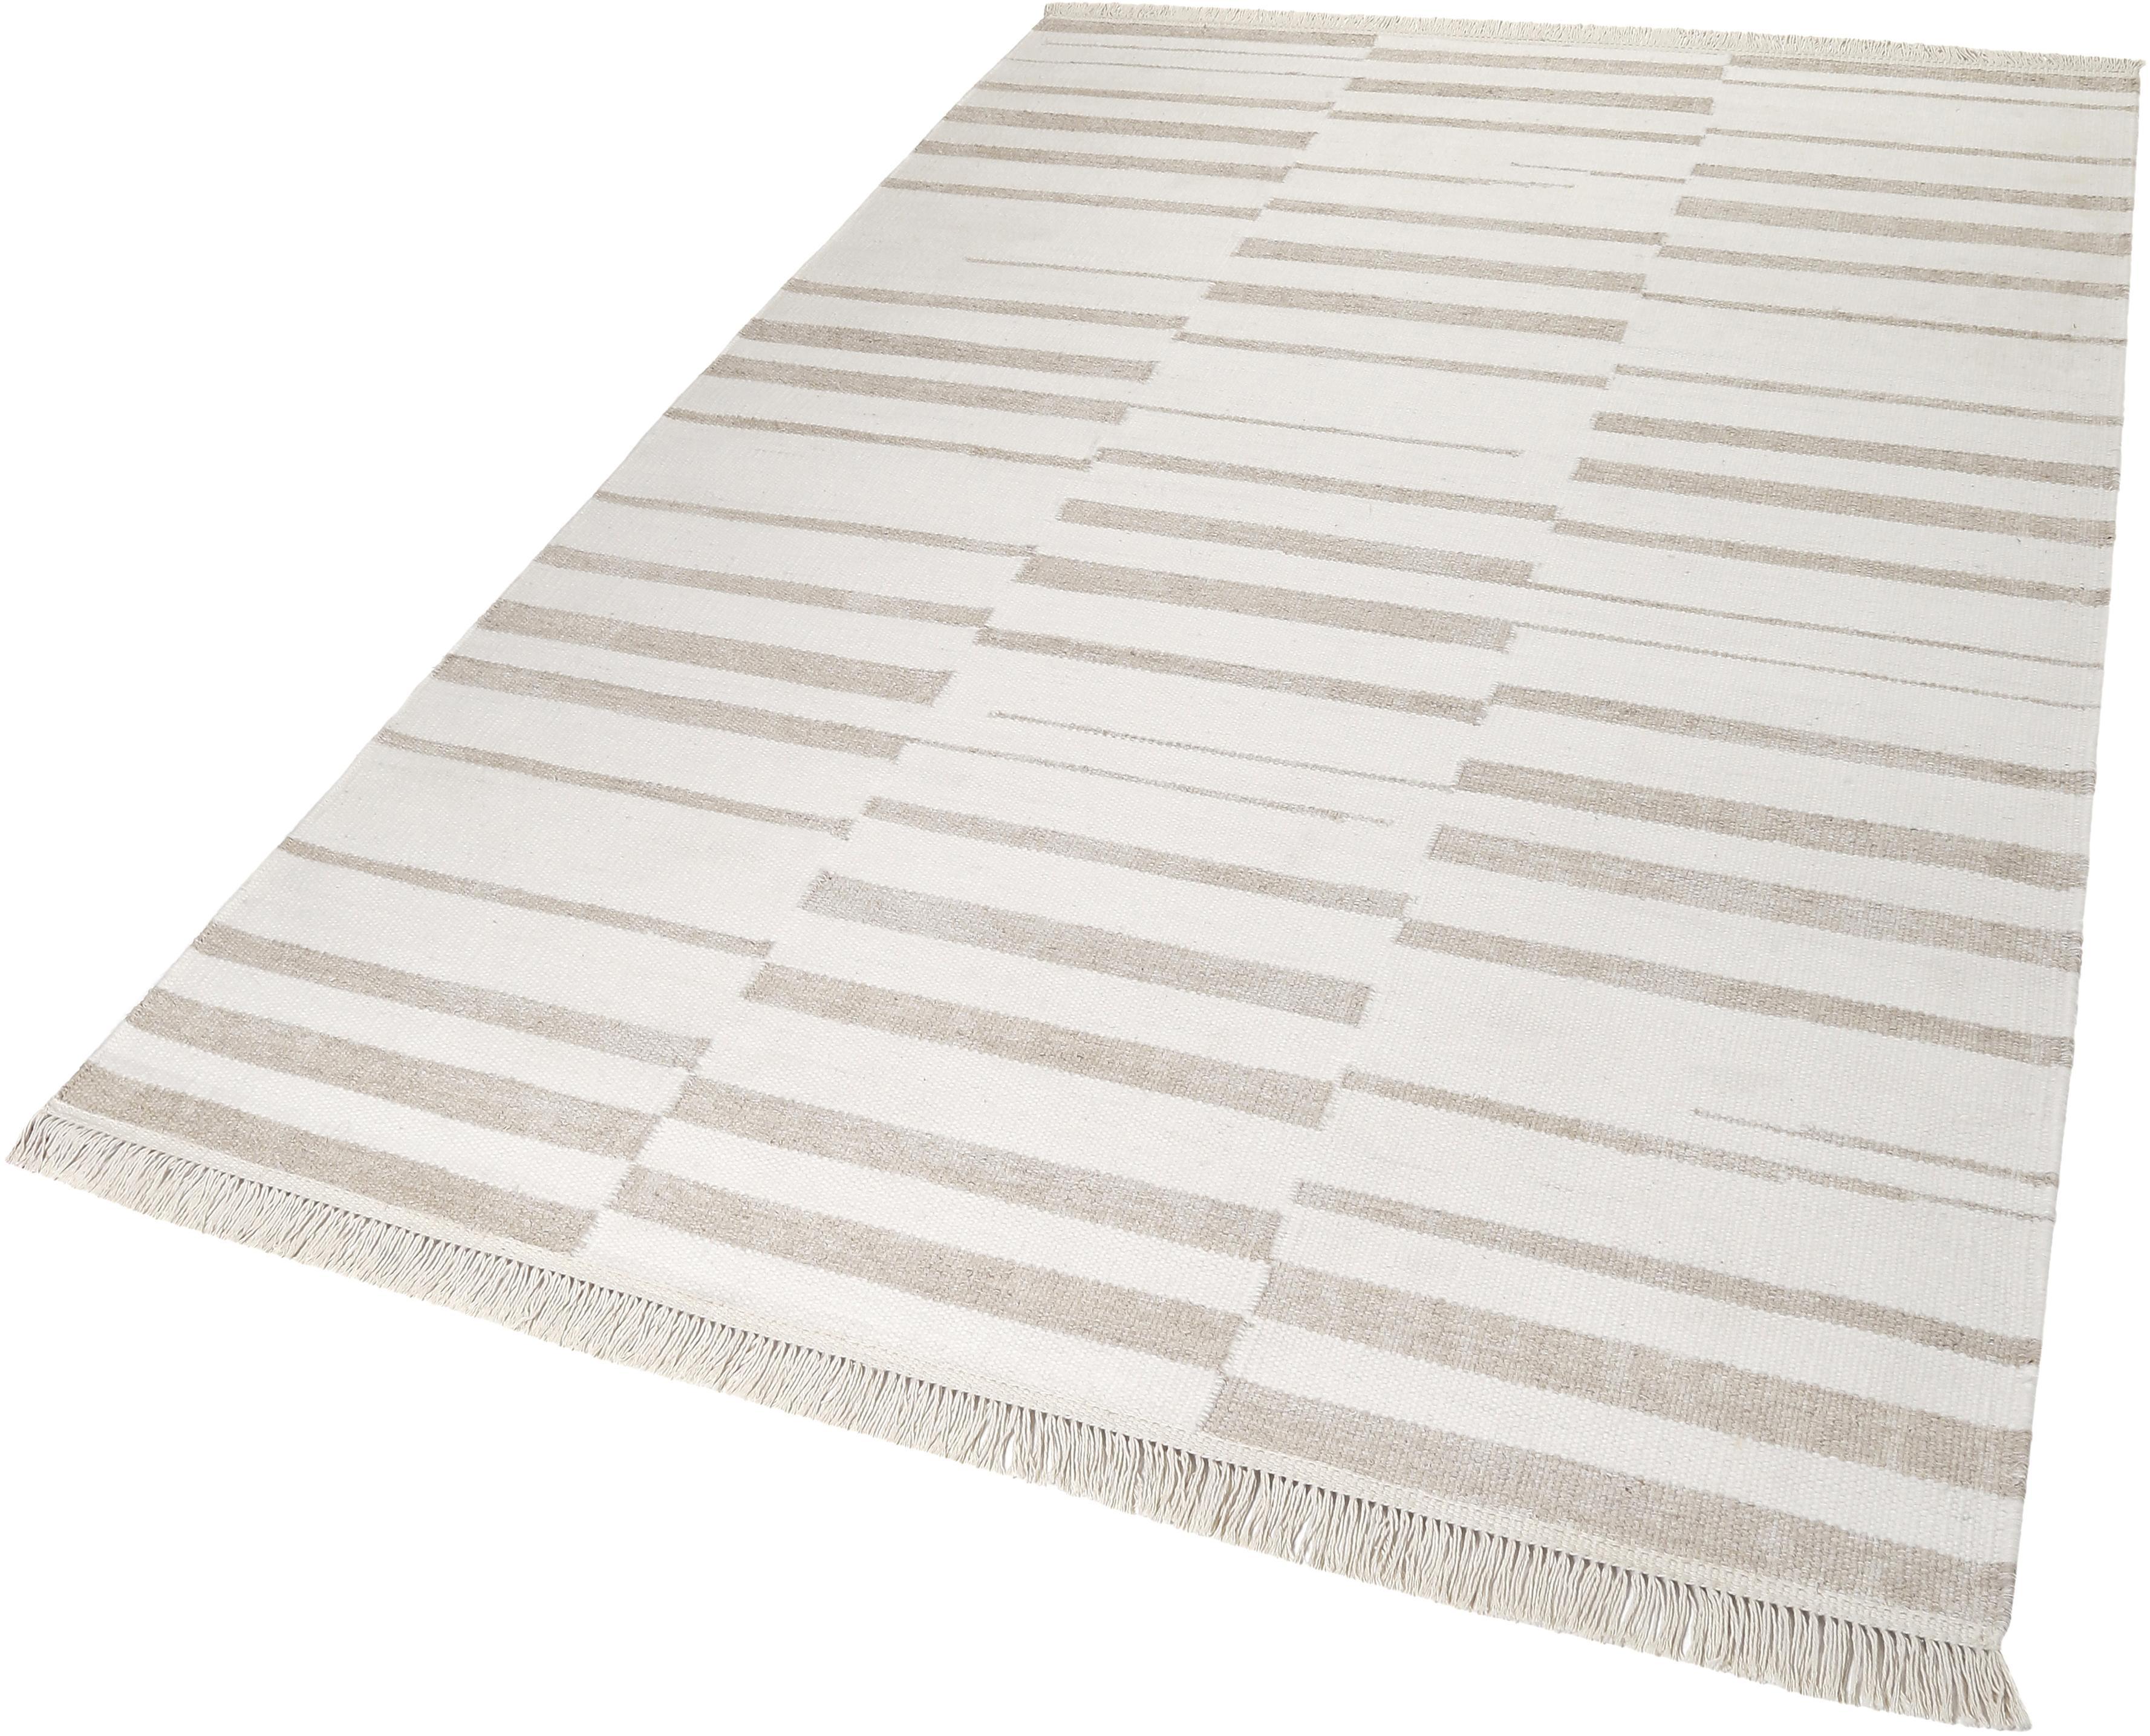 Teppich Skid Marks carpets&co rechteckig Höhe 5 mm handgewebt